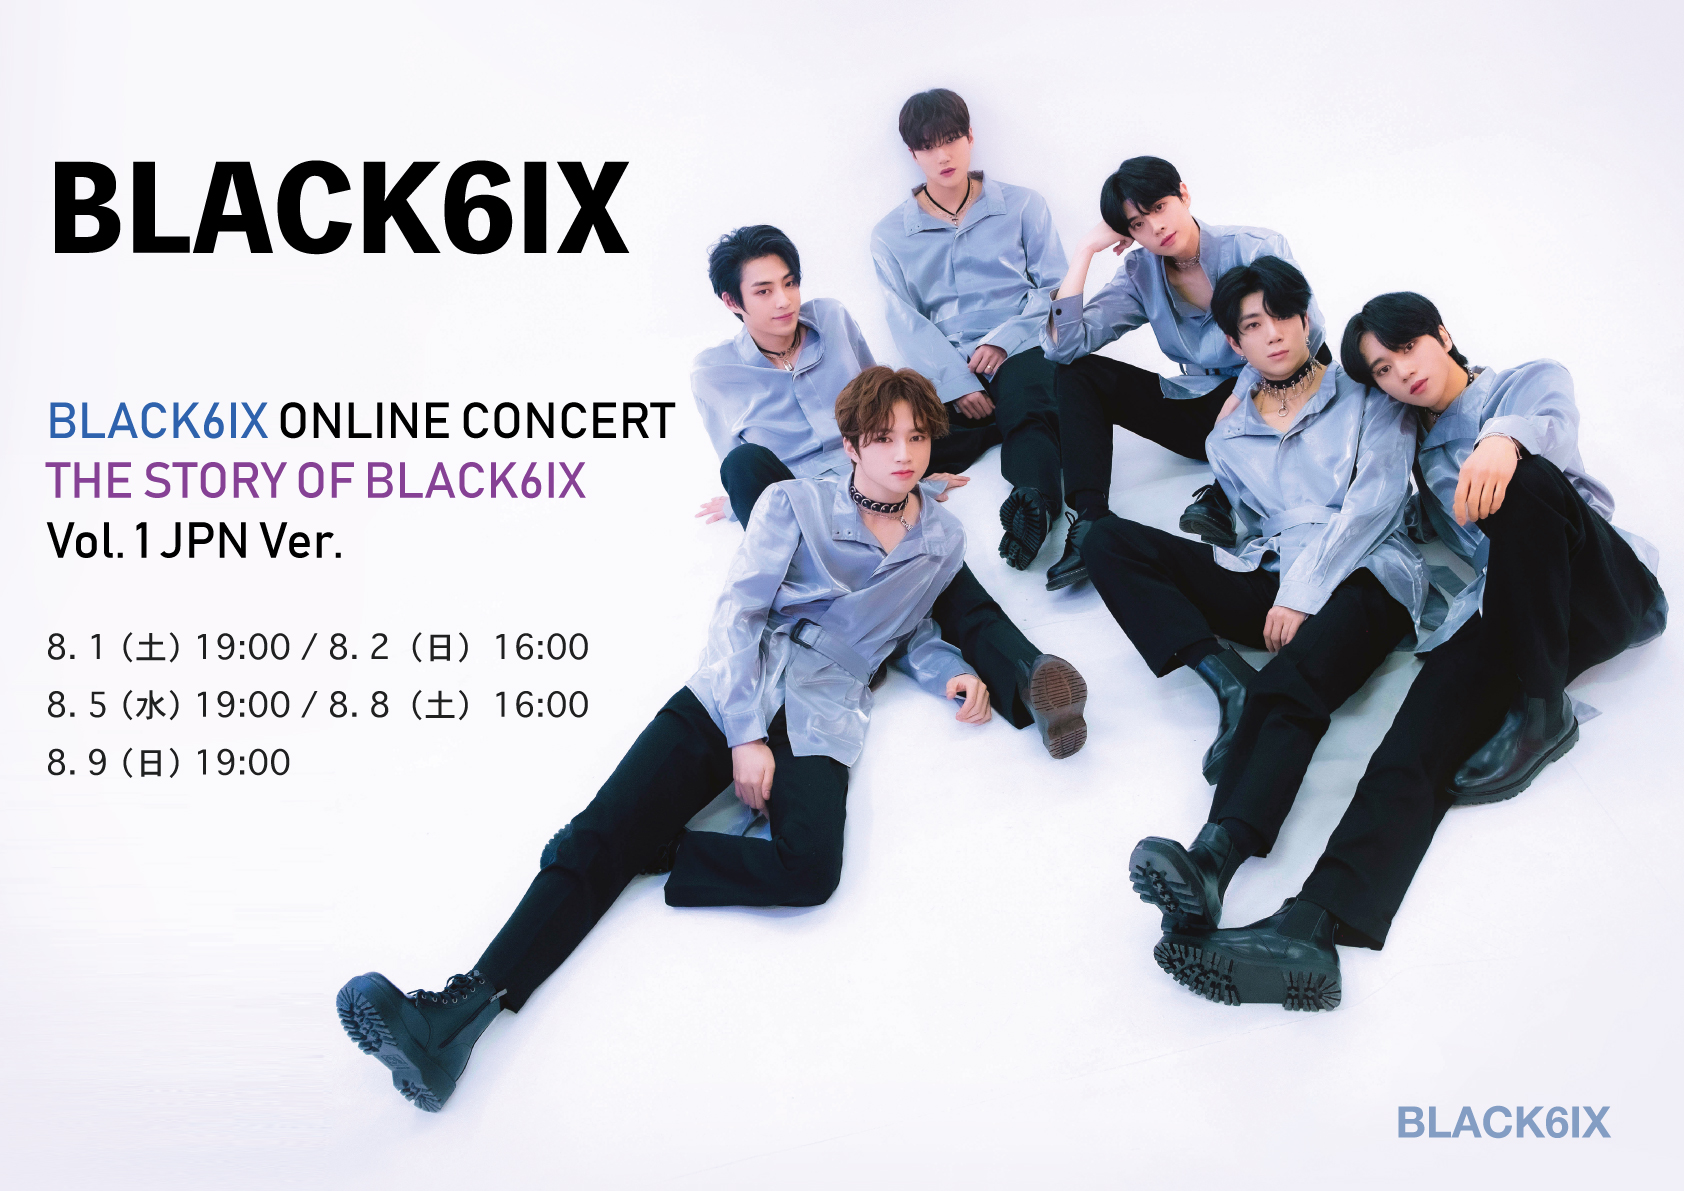 BLACK6IXオンラインコンサート